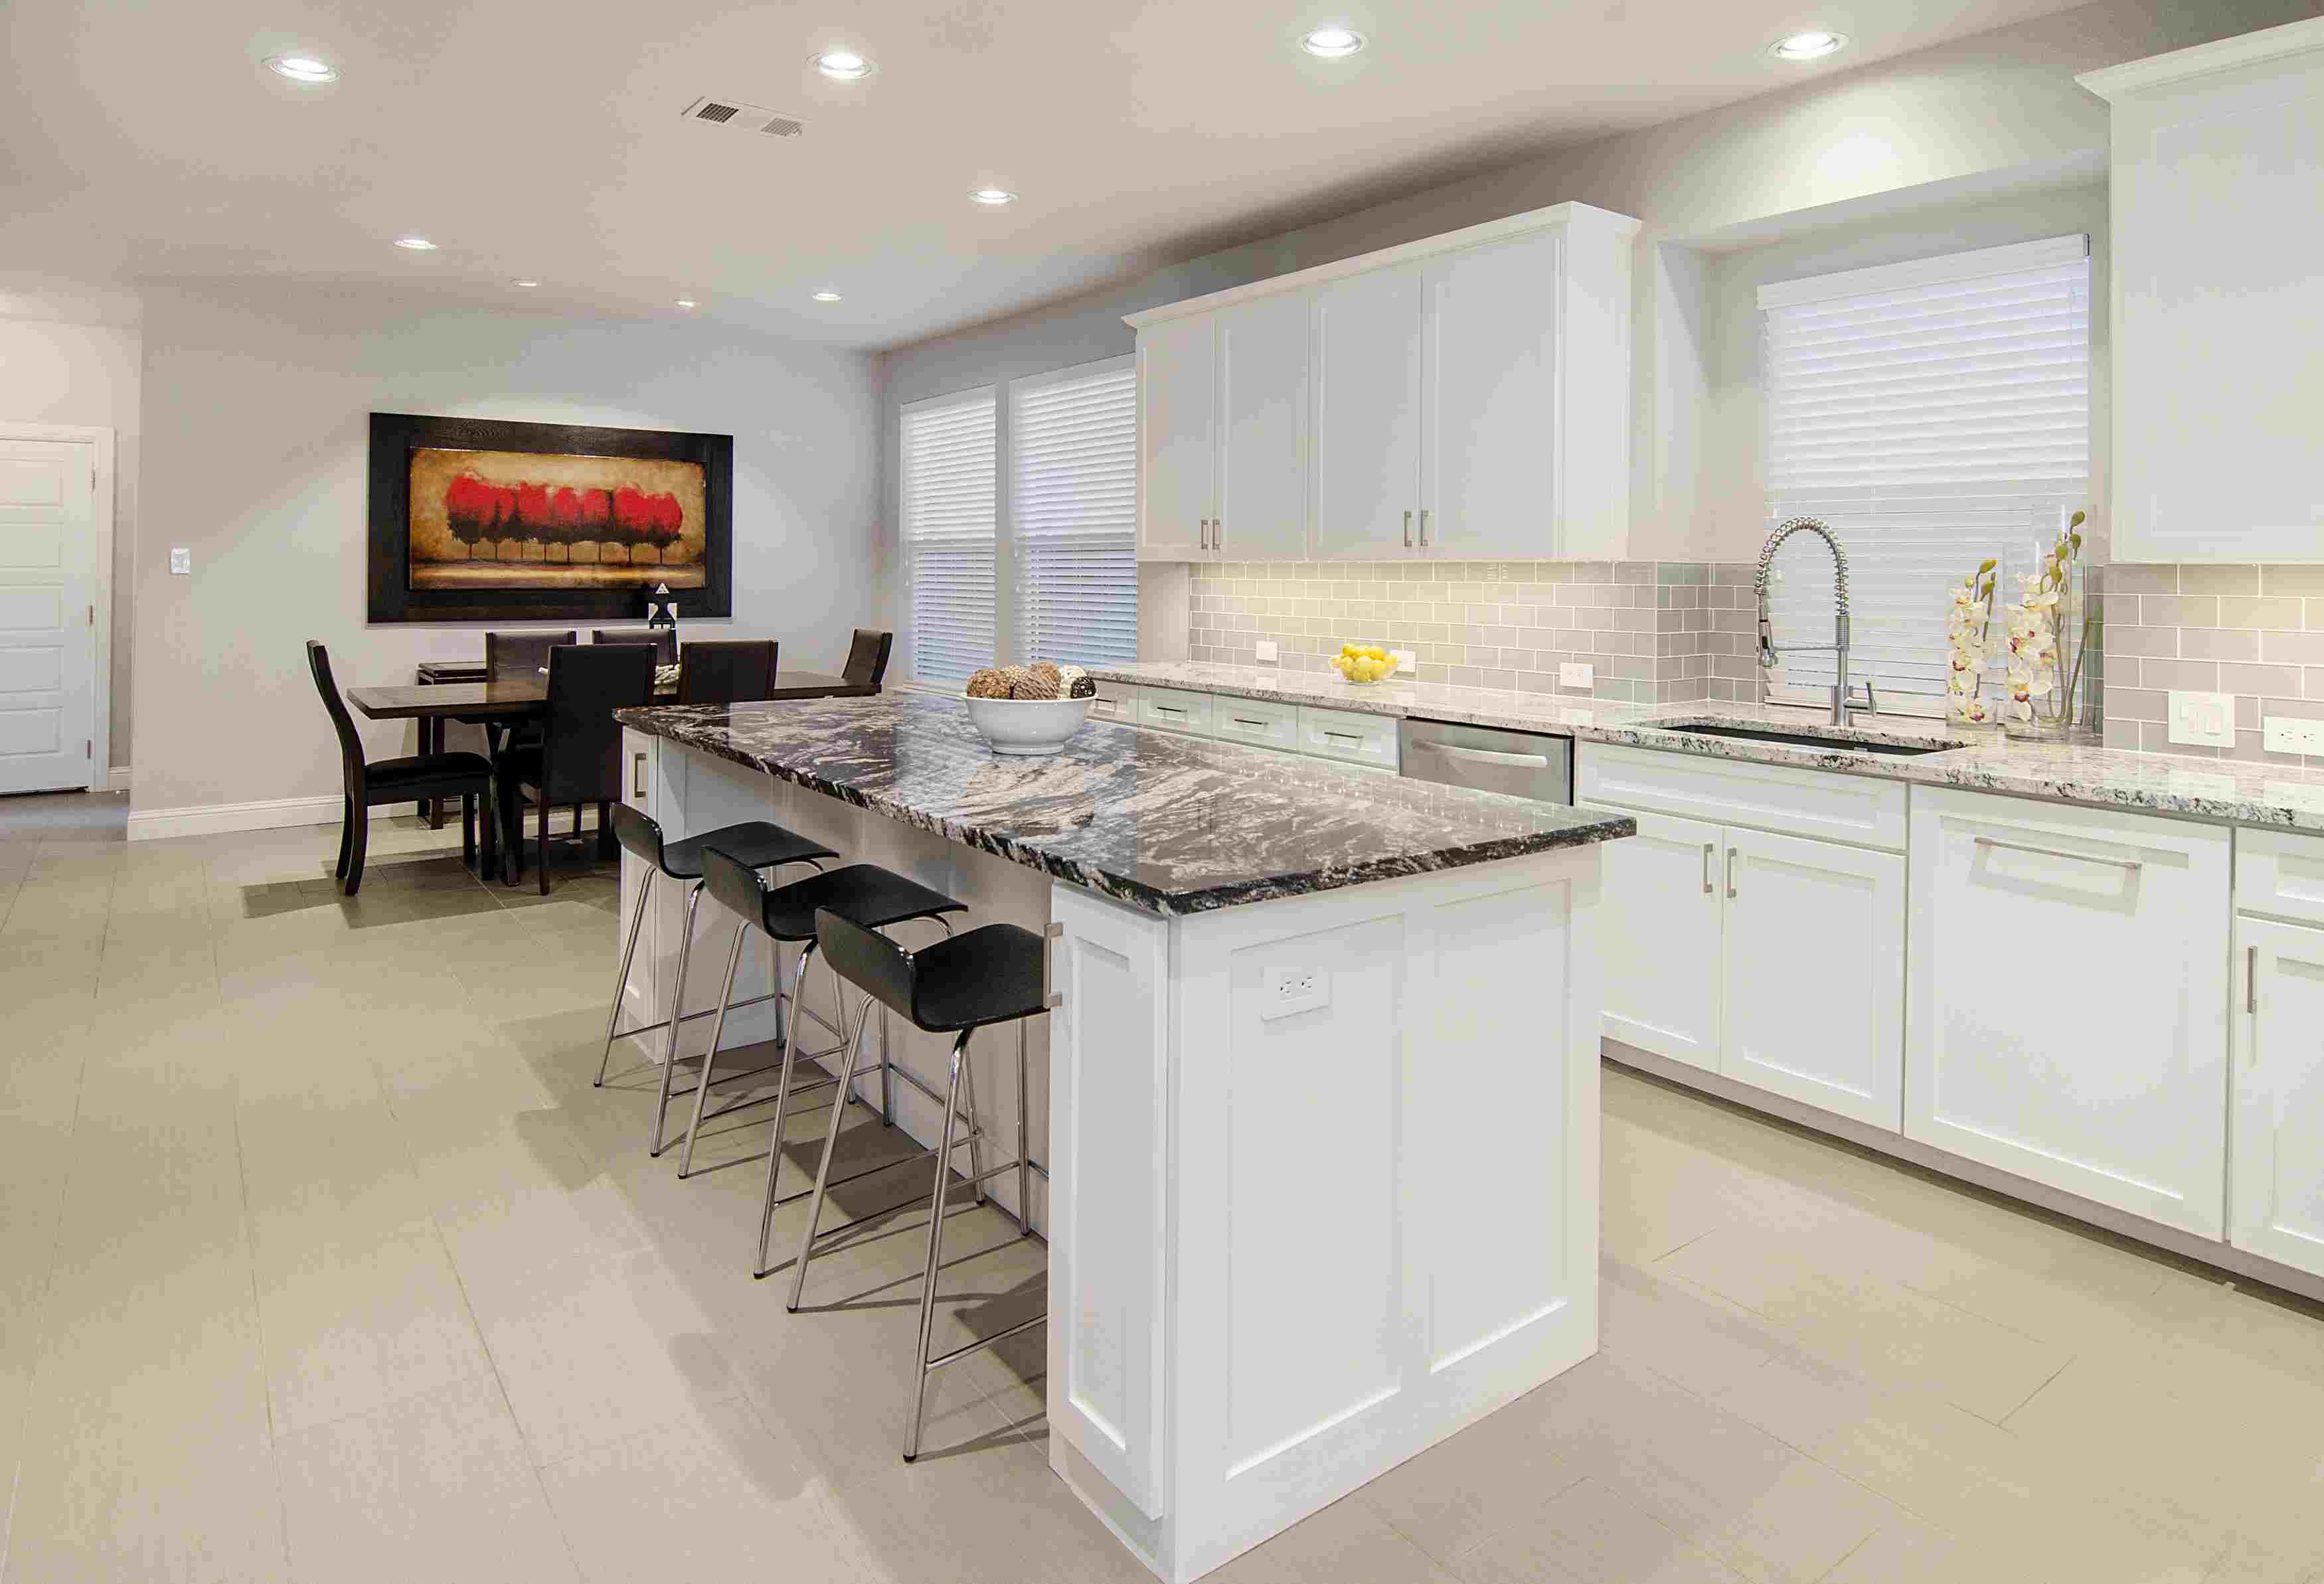 Two different granite countertops in kitchen